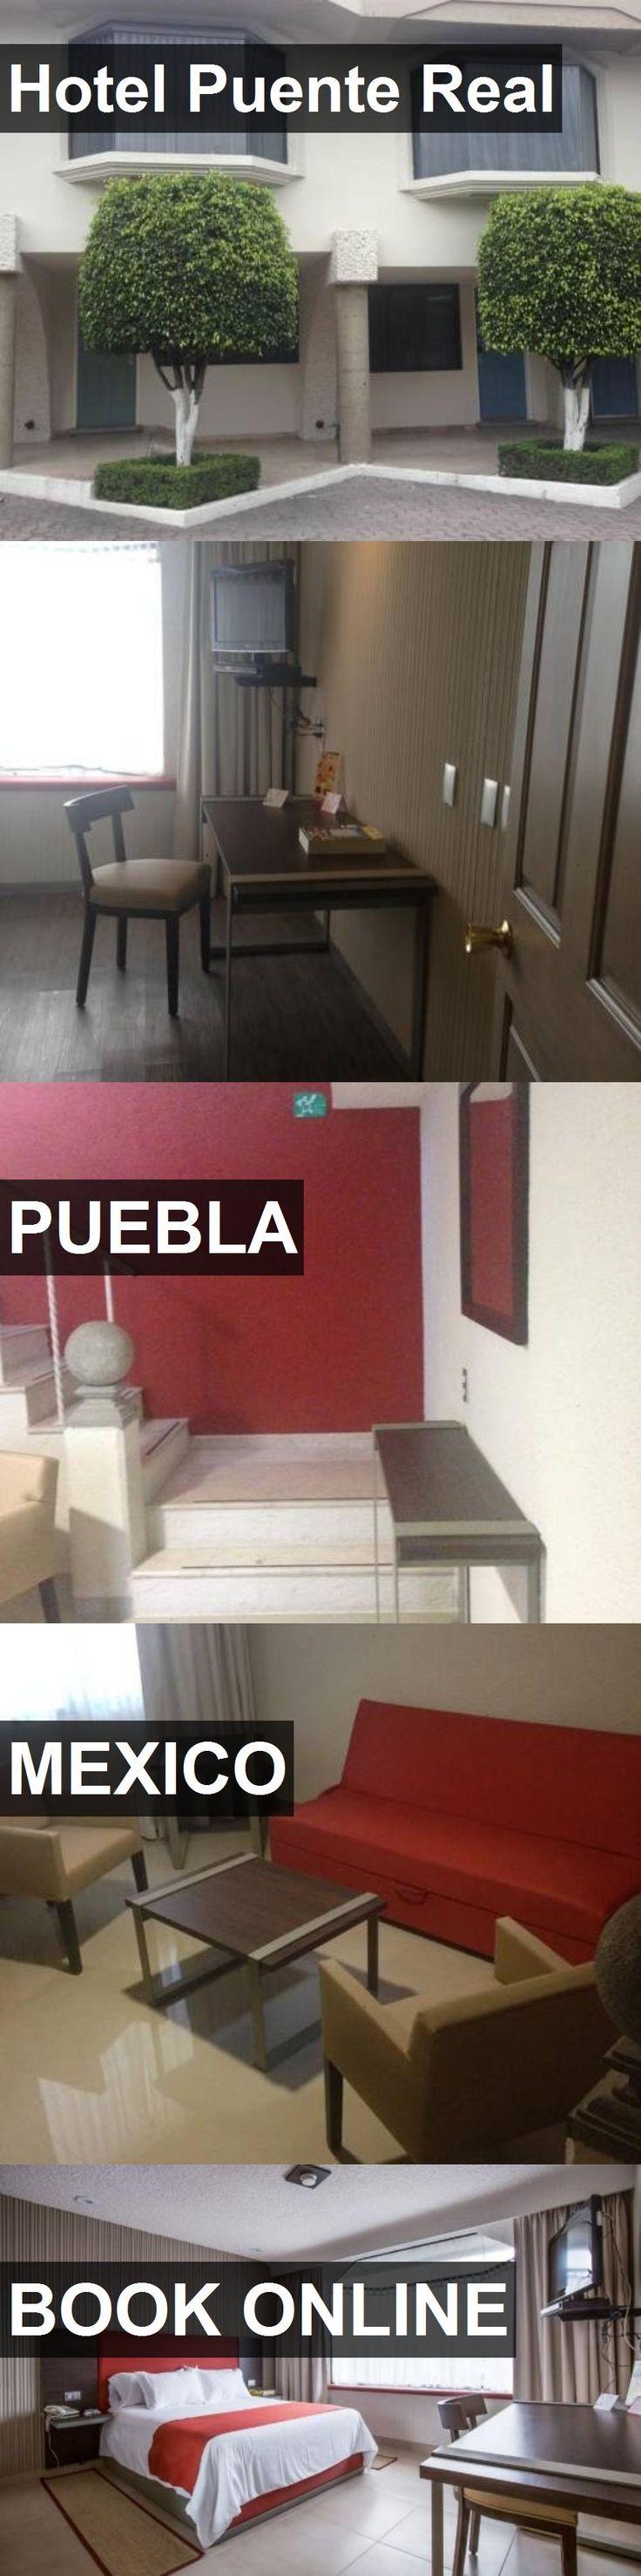 M S De 25 Ideas Incre Bles Sobre Puente Real En Pinterest I Leon  # Muebles Ucero Soria